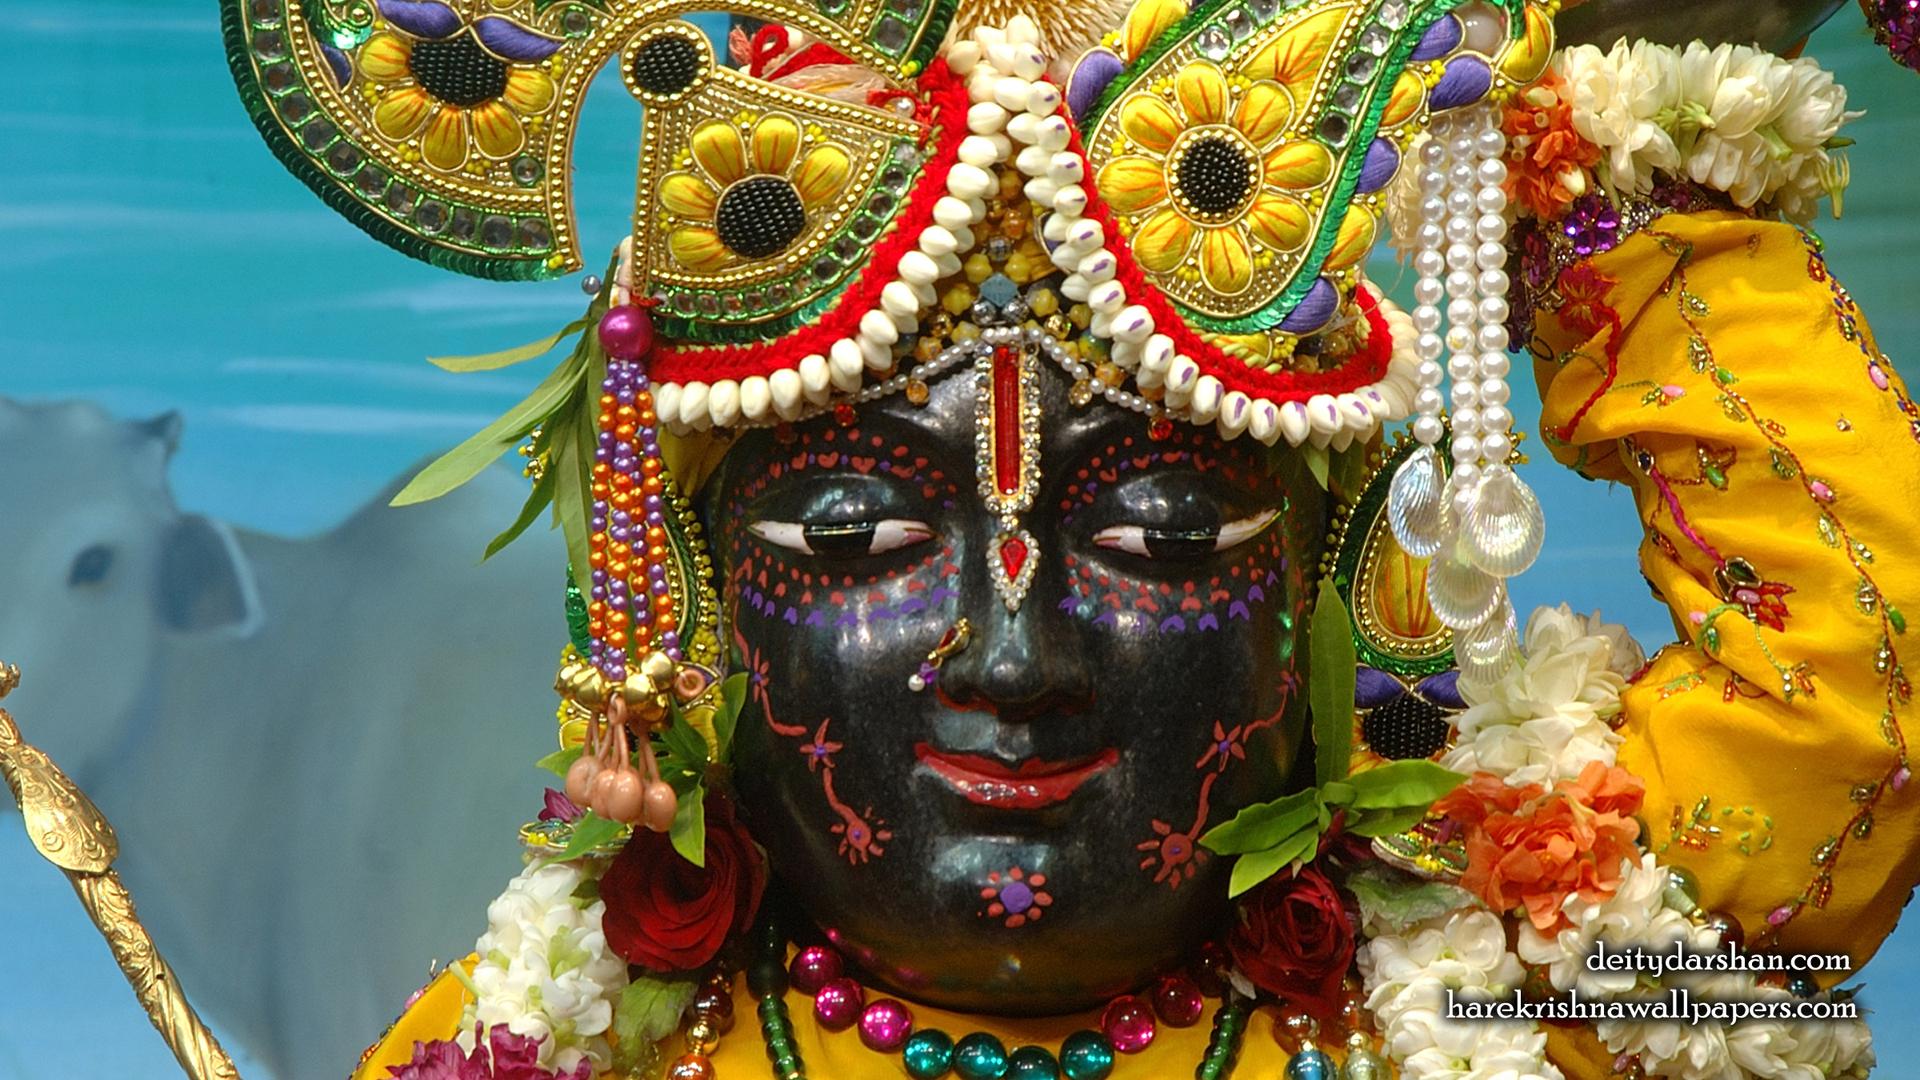 Sri Gopal Close up Wallpaper (057) Size 1920x1080 Download